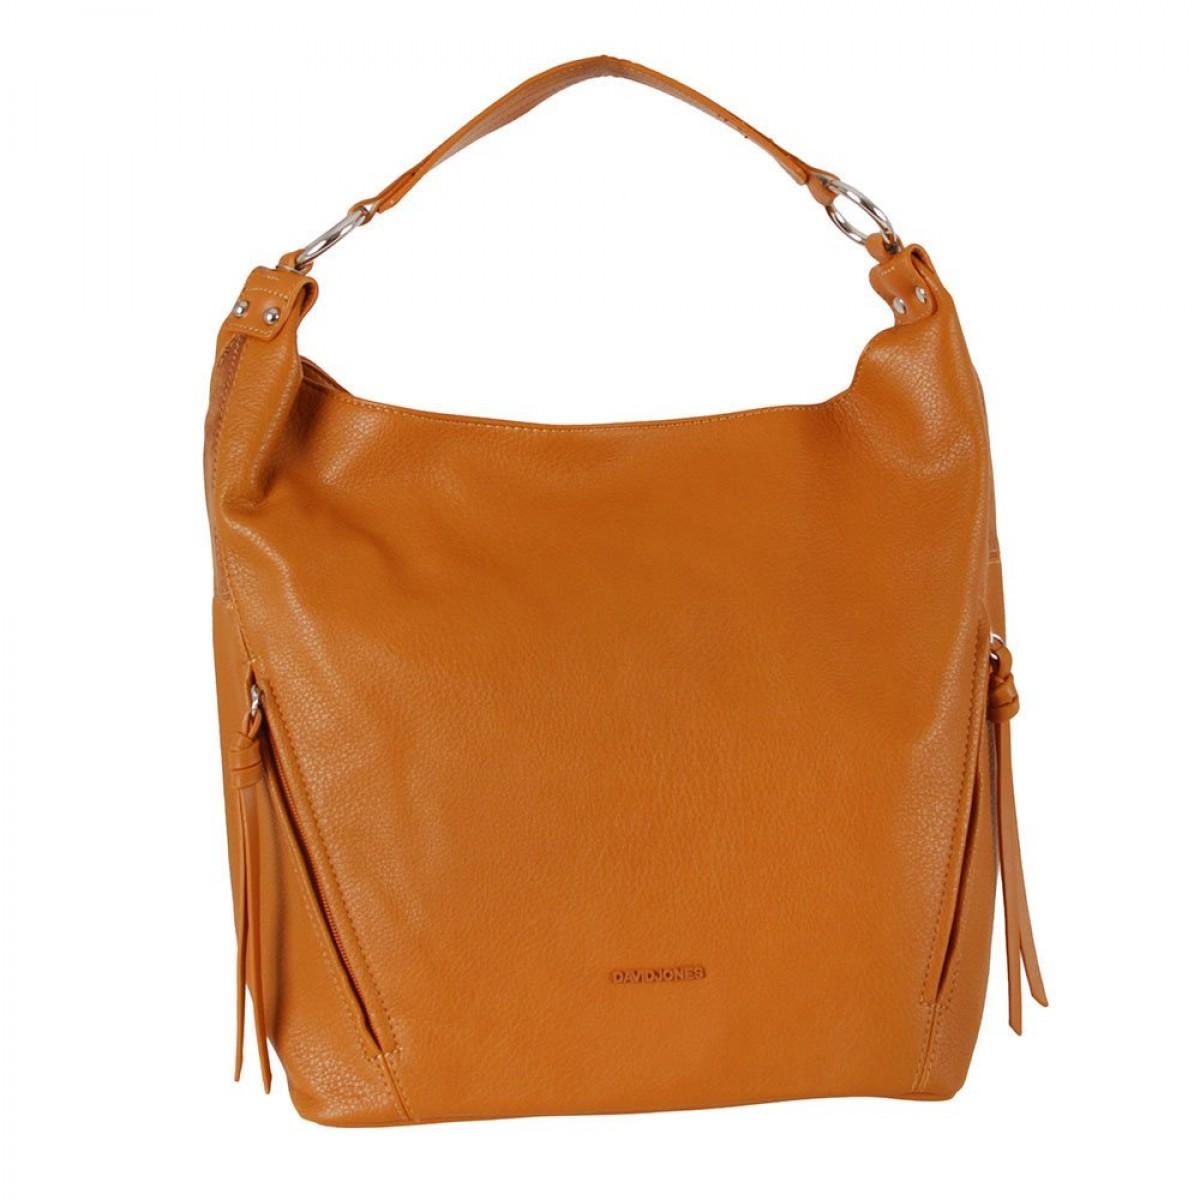 Жіноча сумка David Jones CM6003 CARAMEL